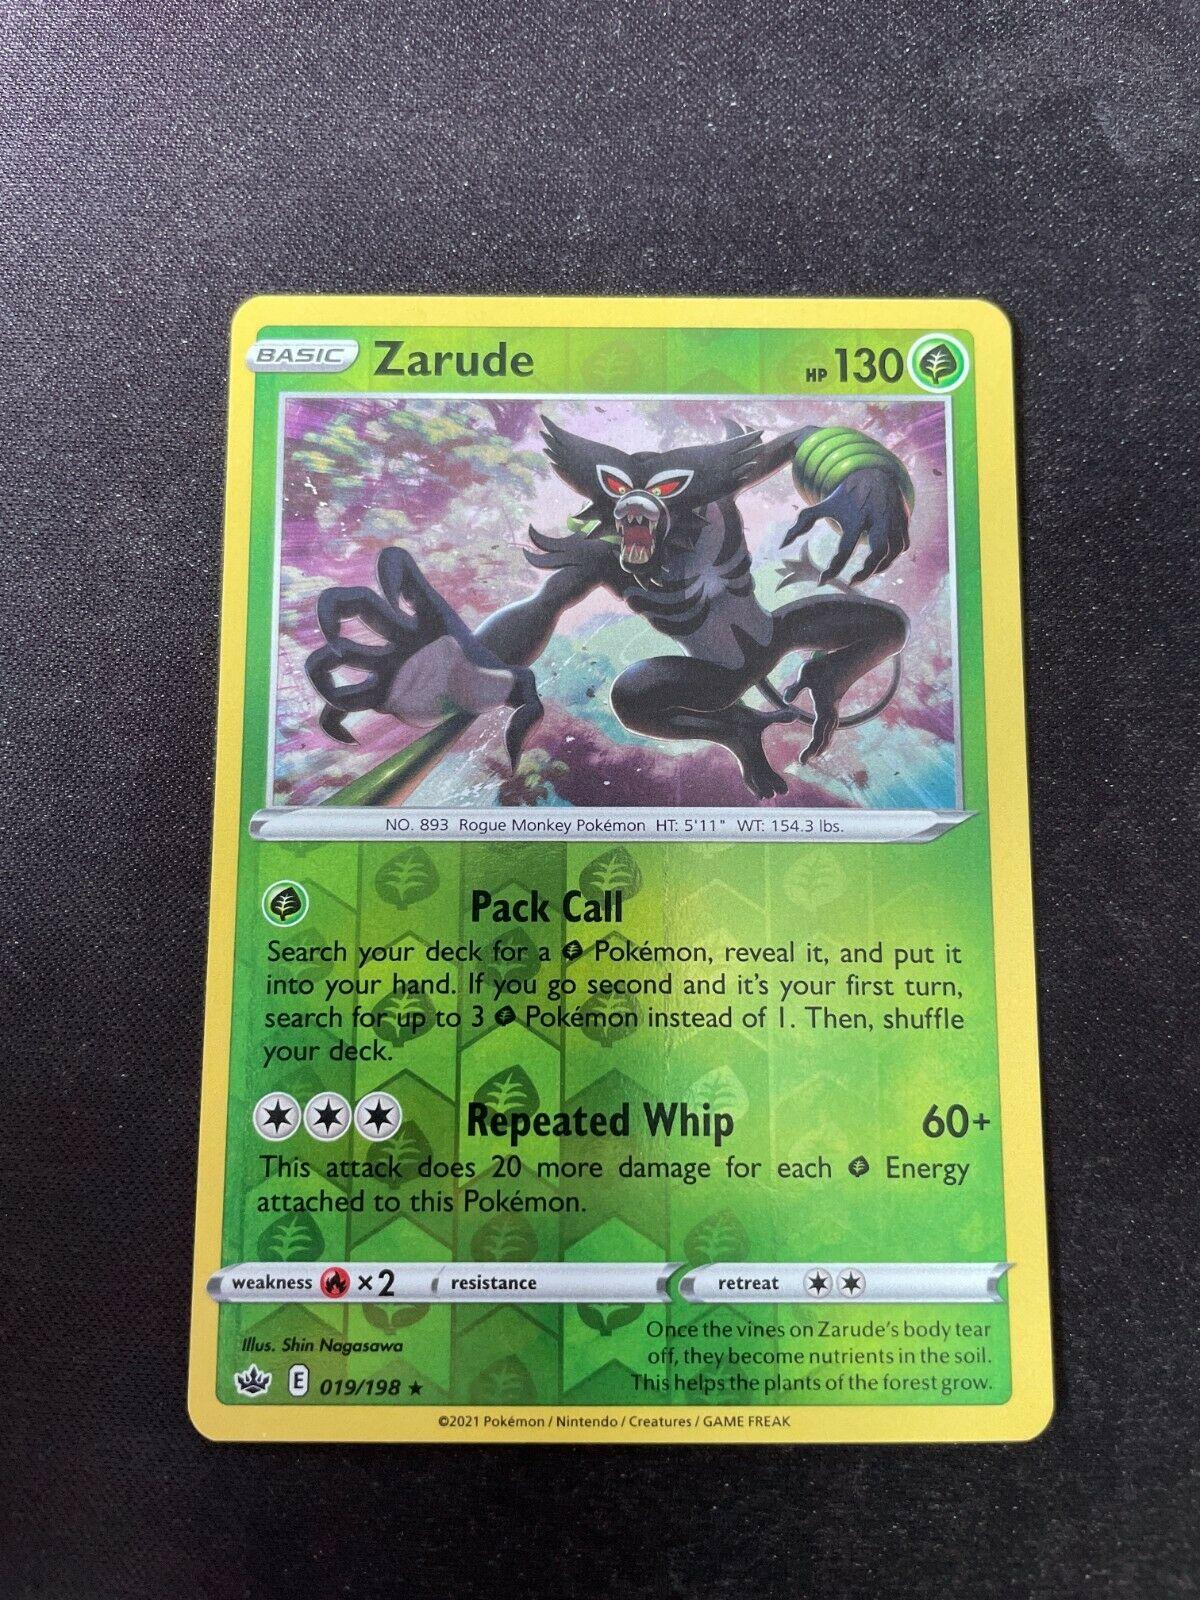 Pokemon TCG Chilling Reign 019/198 Zarude Card Fresh Reverse Holo Mint Rare